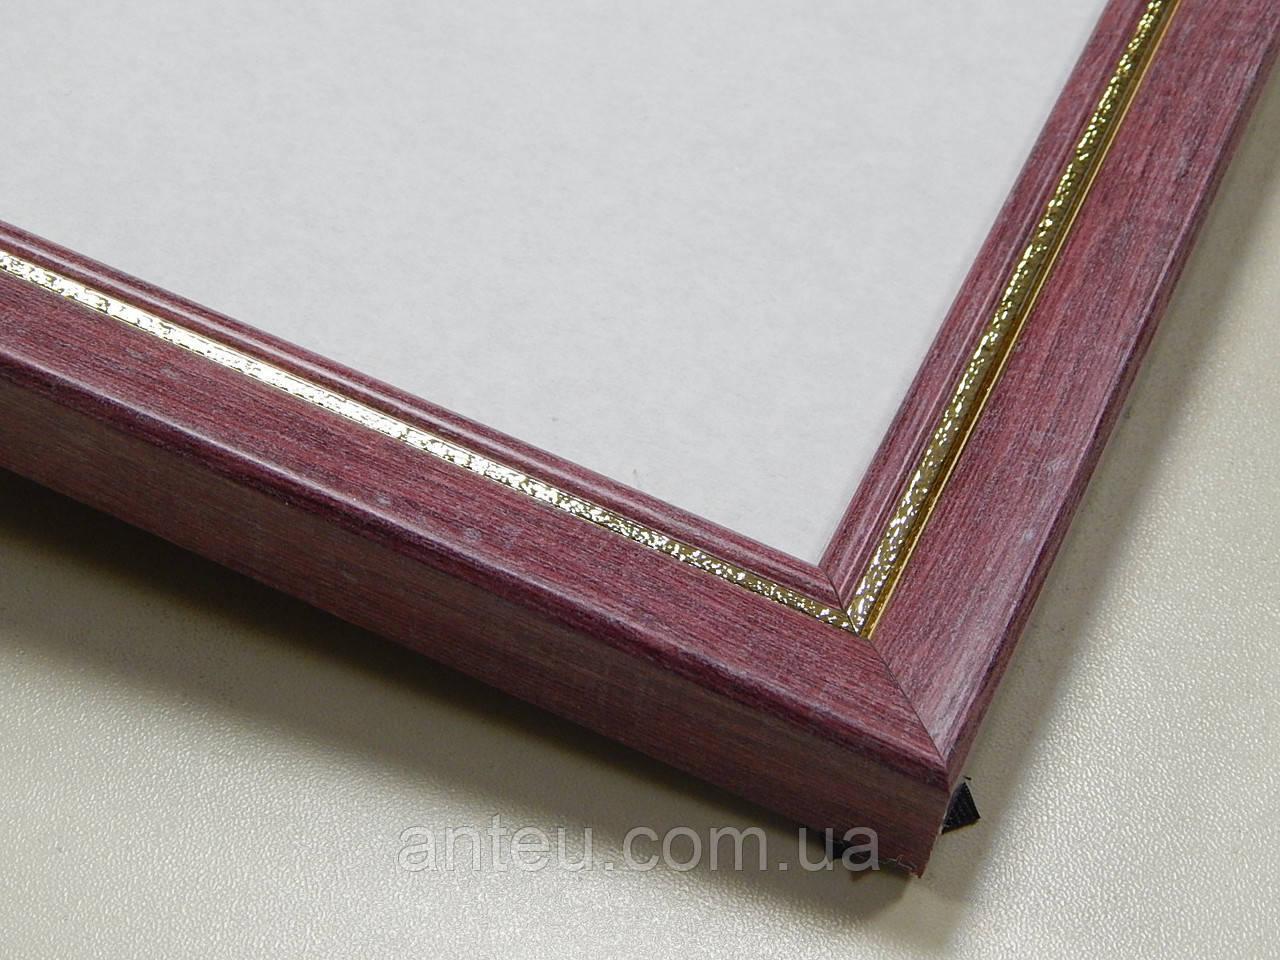 РАМКА А2(420х594)Антибликовое стеклоРамки для фото,вышивок,картин.